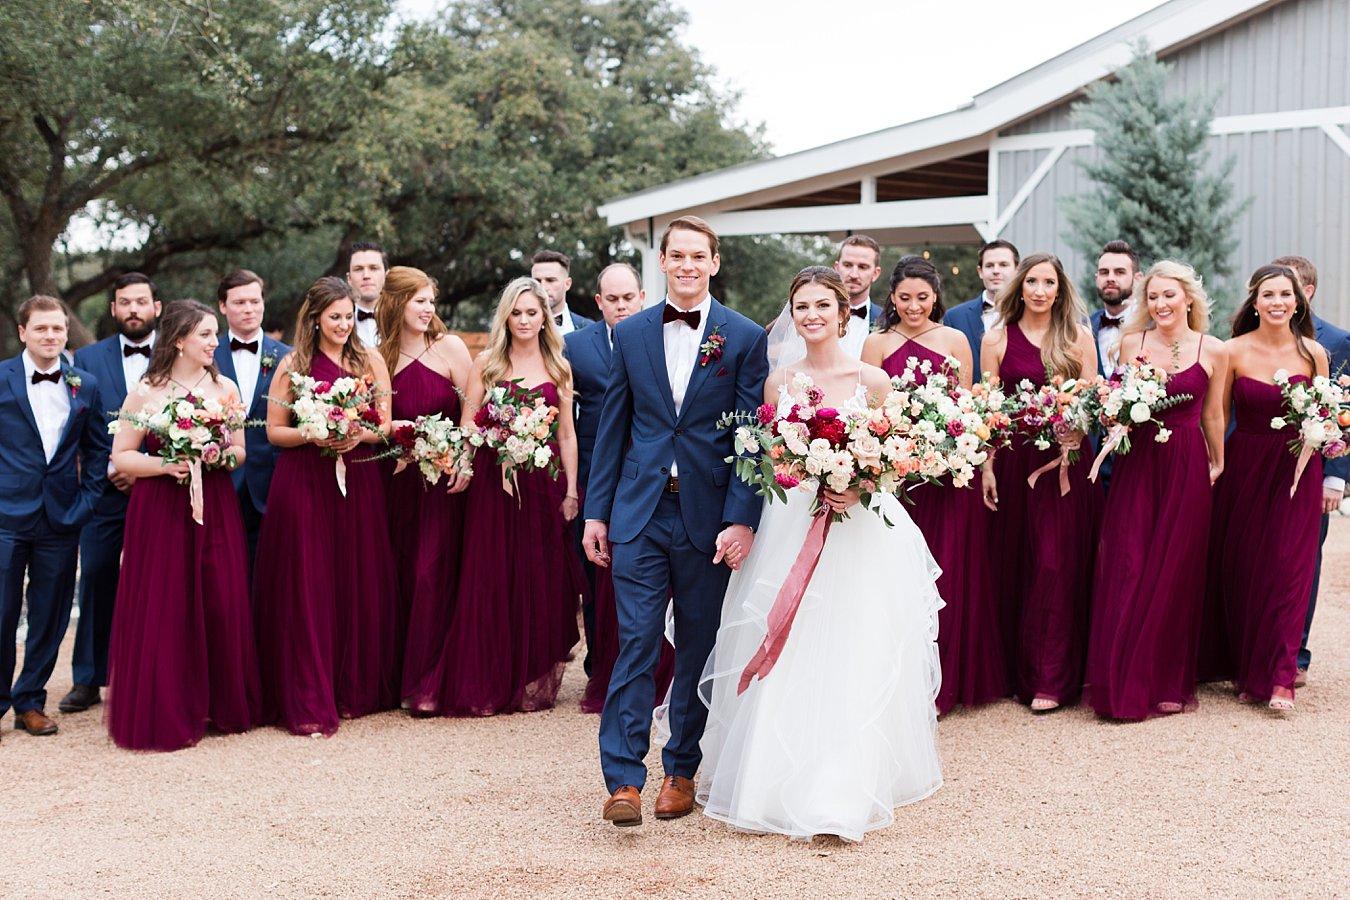 Addison-Grove-Wedding-Photos-Dripping-Springs-TX-5150.jpg